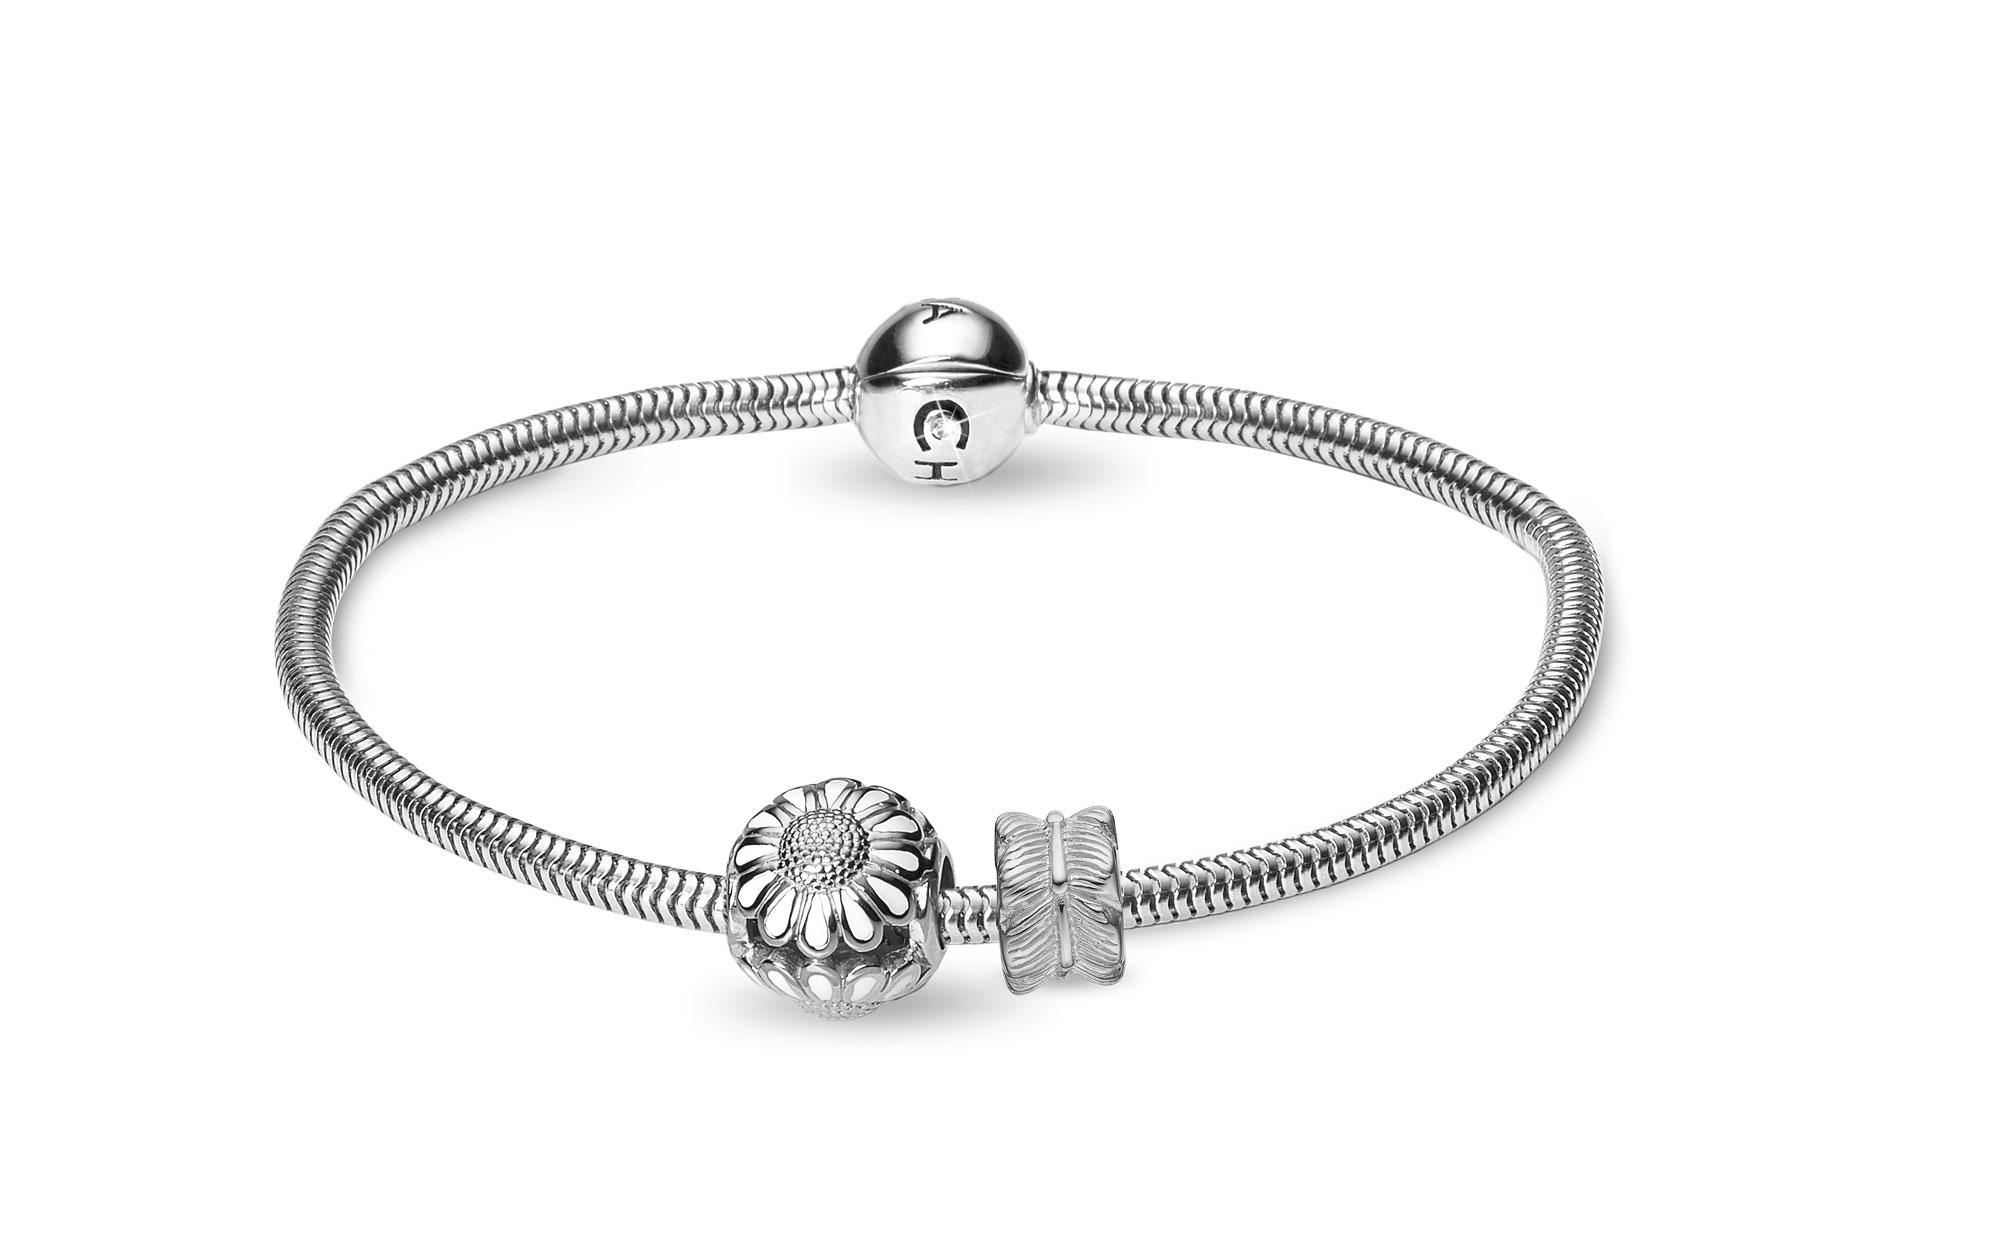 Image of CHRISTINA Silver Bracelet Kampagne - 615-S 16 centimeter